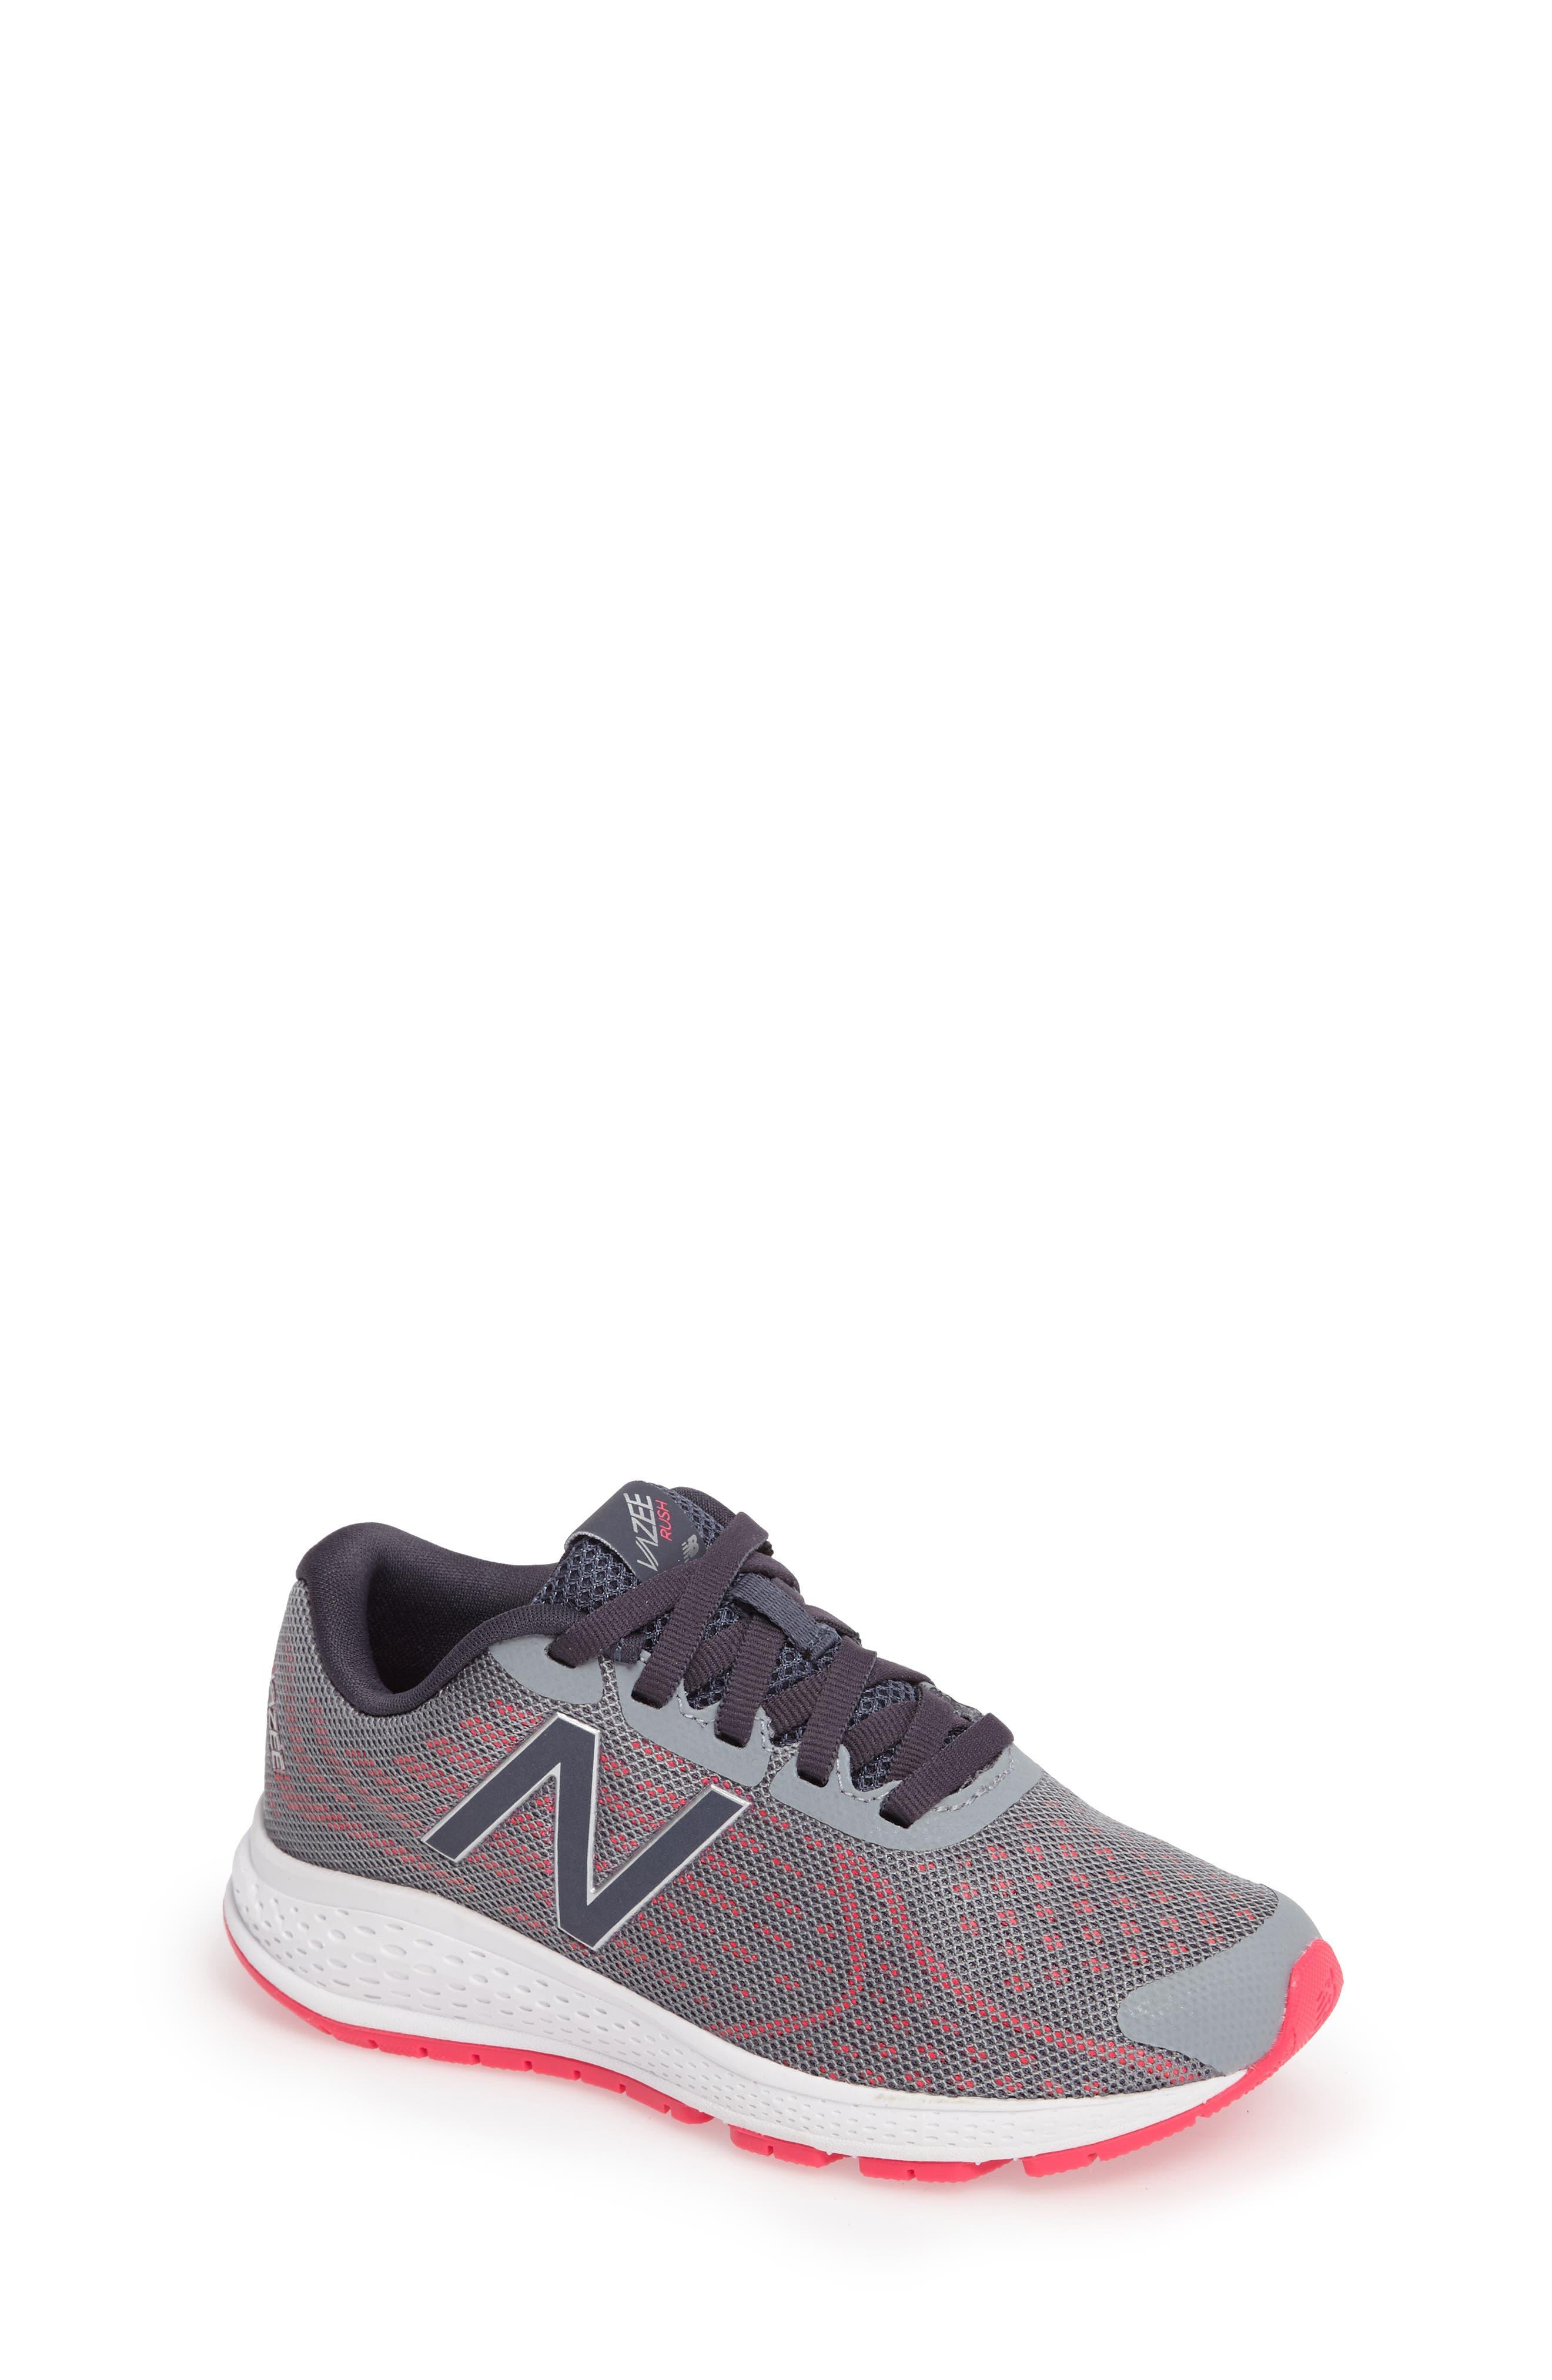 New Balance Vazee Rush Sneaker (Toddler, Little Kid & Big Kid)